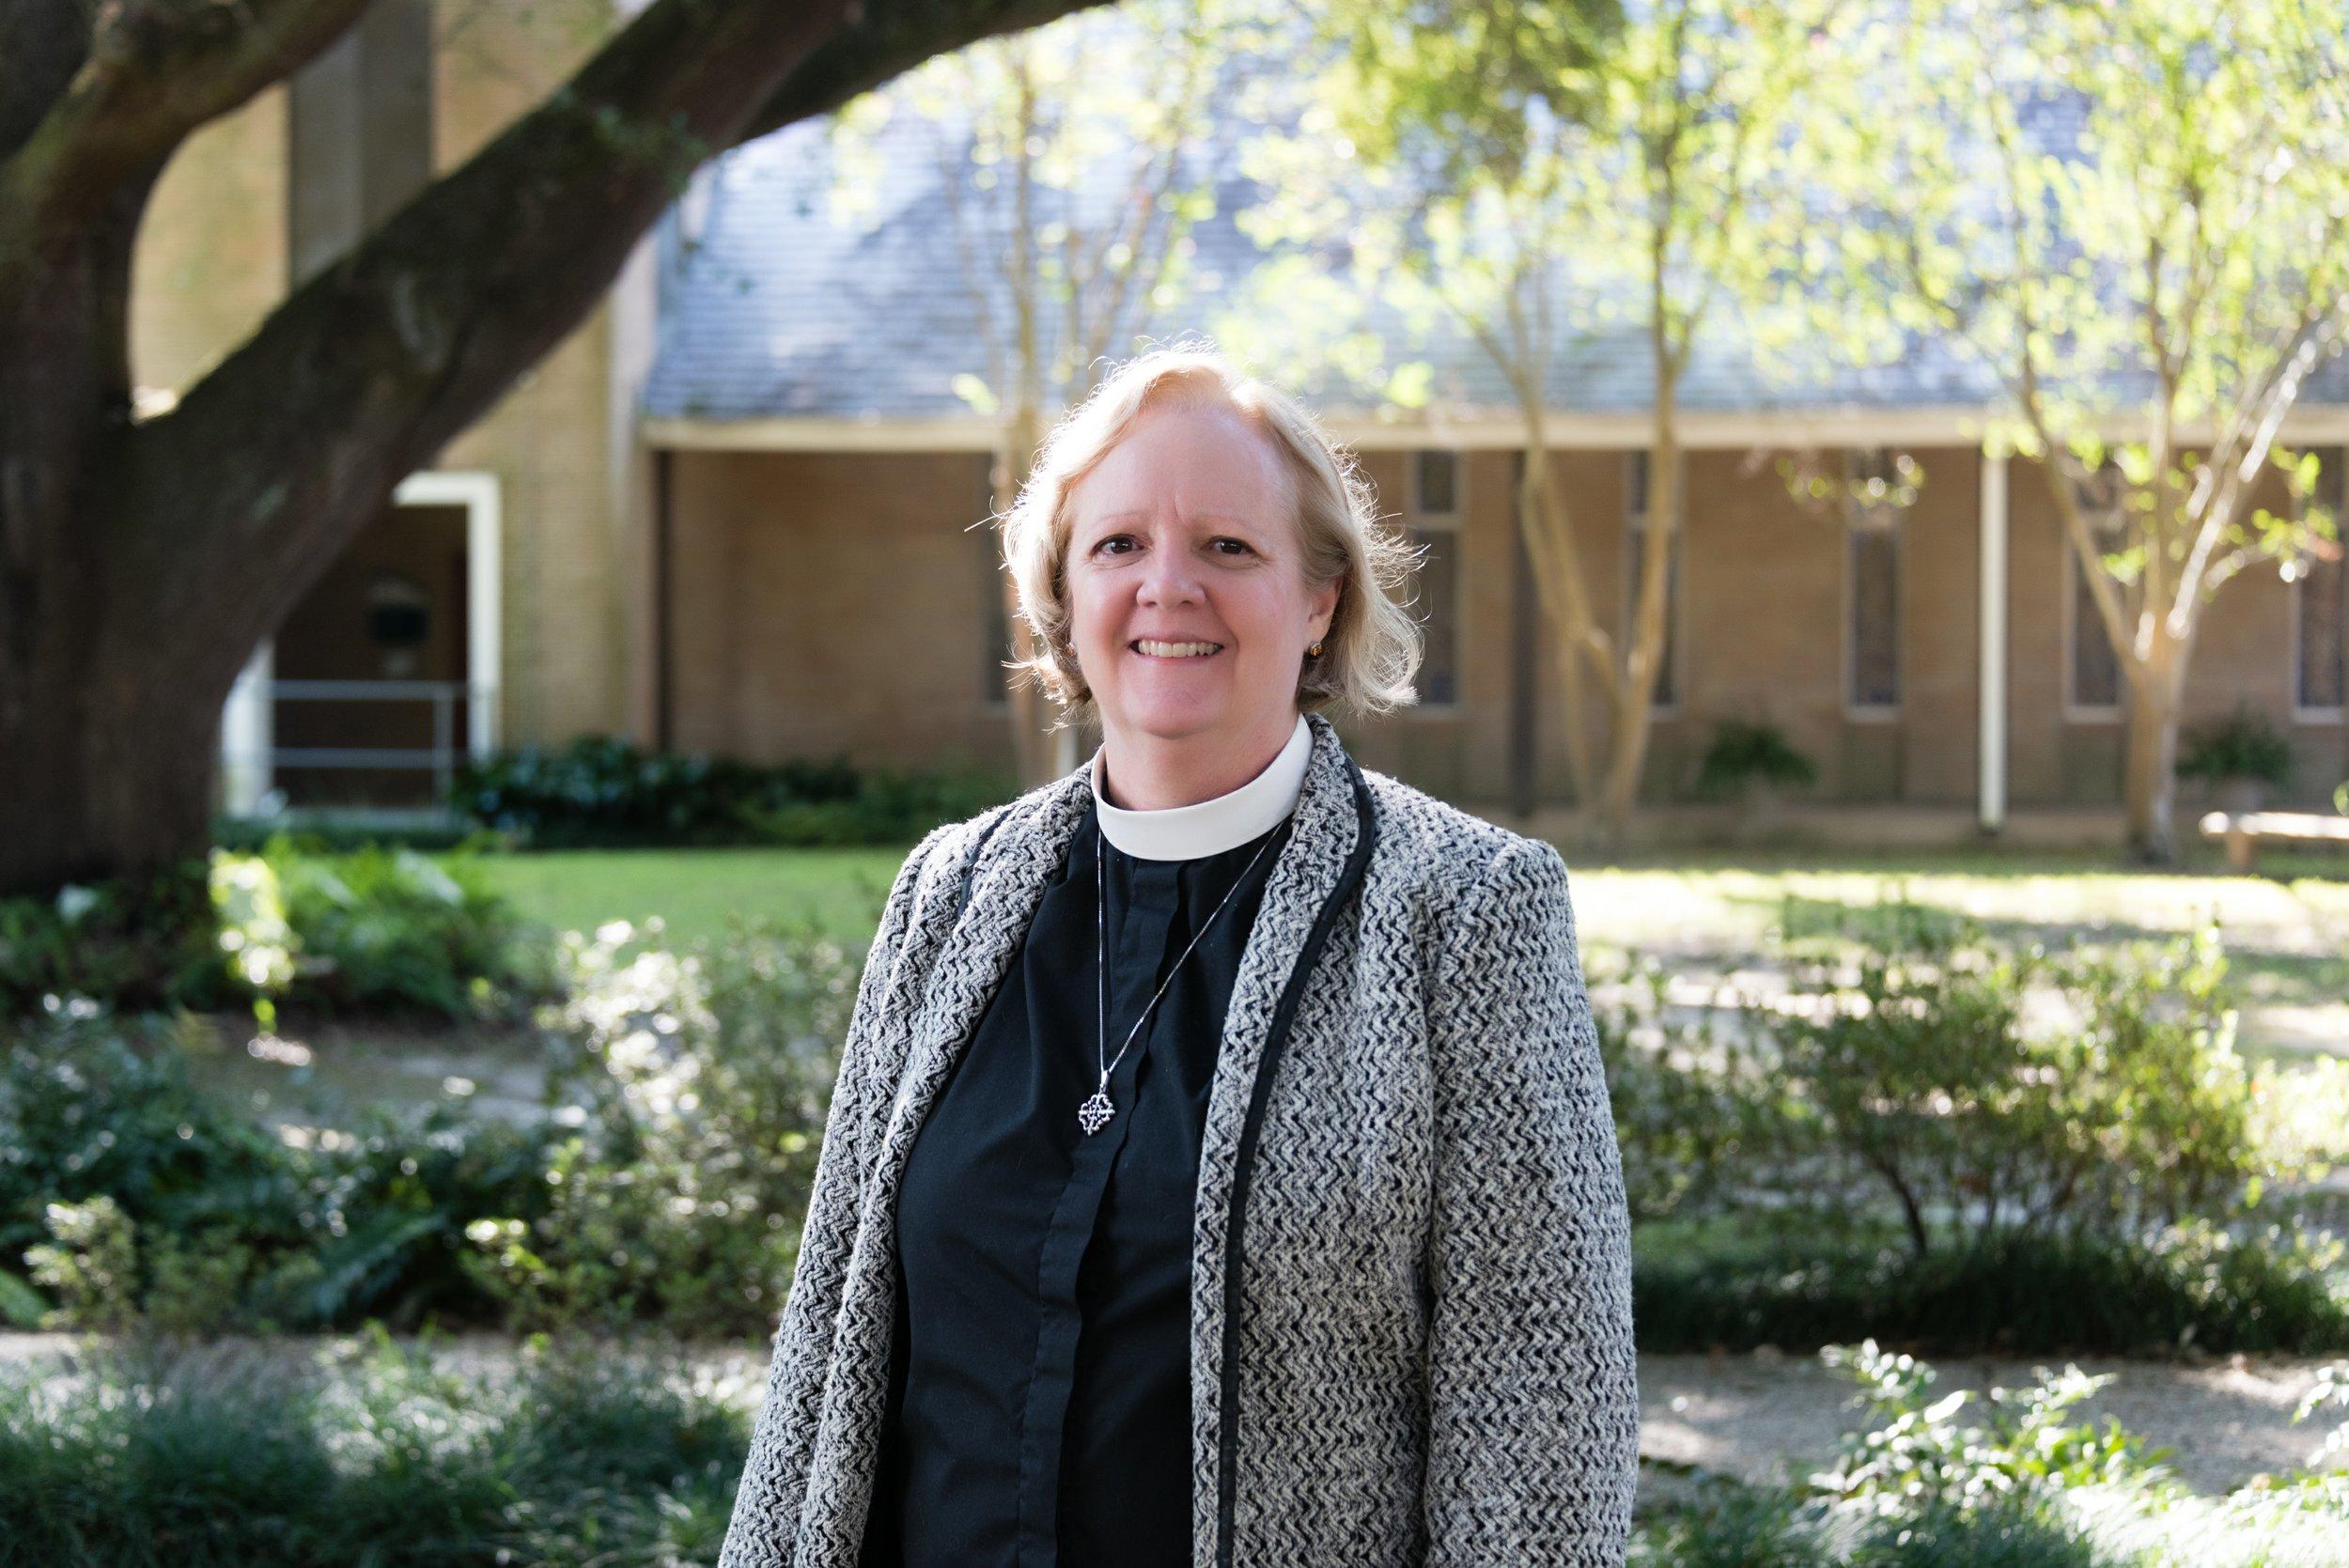 Reverend Sharon Alexander